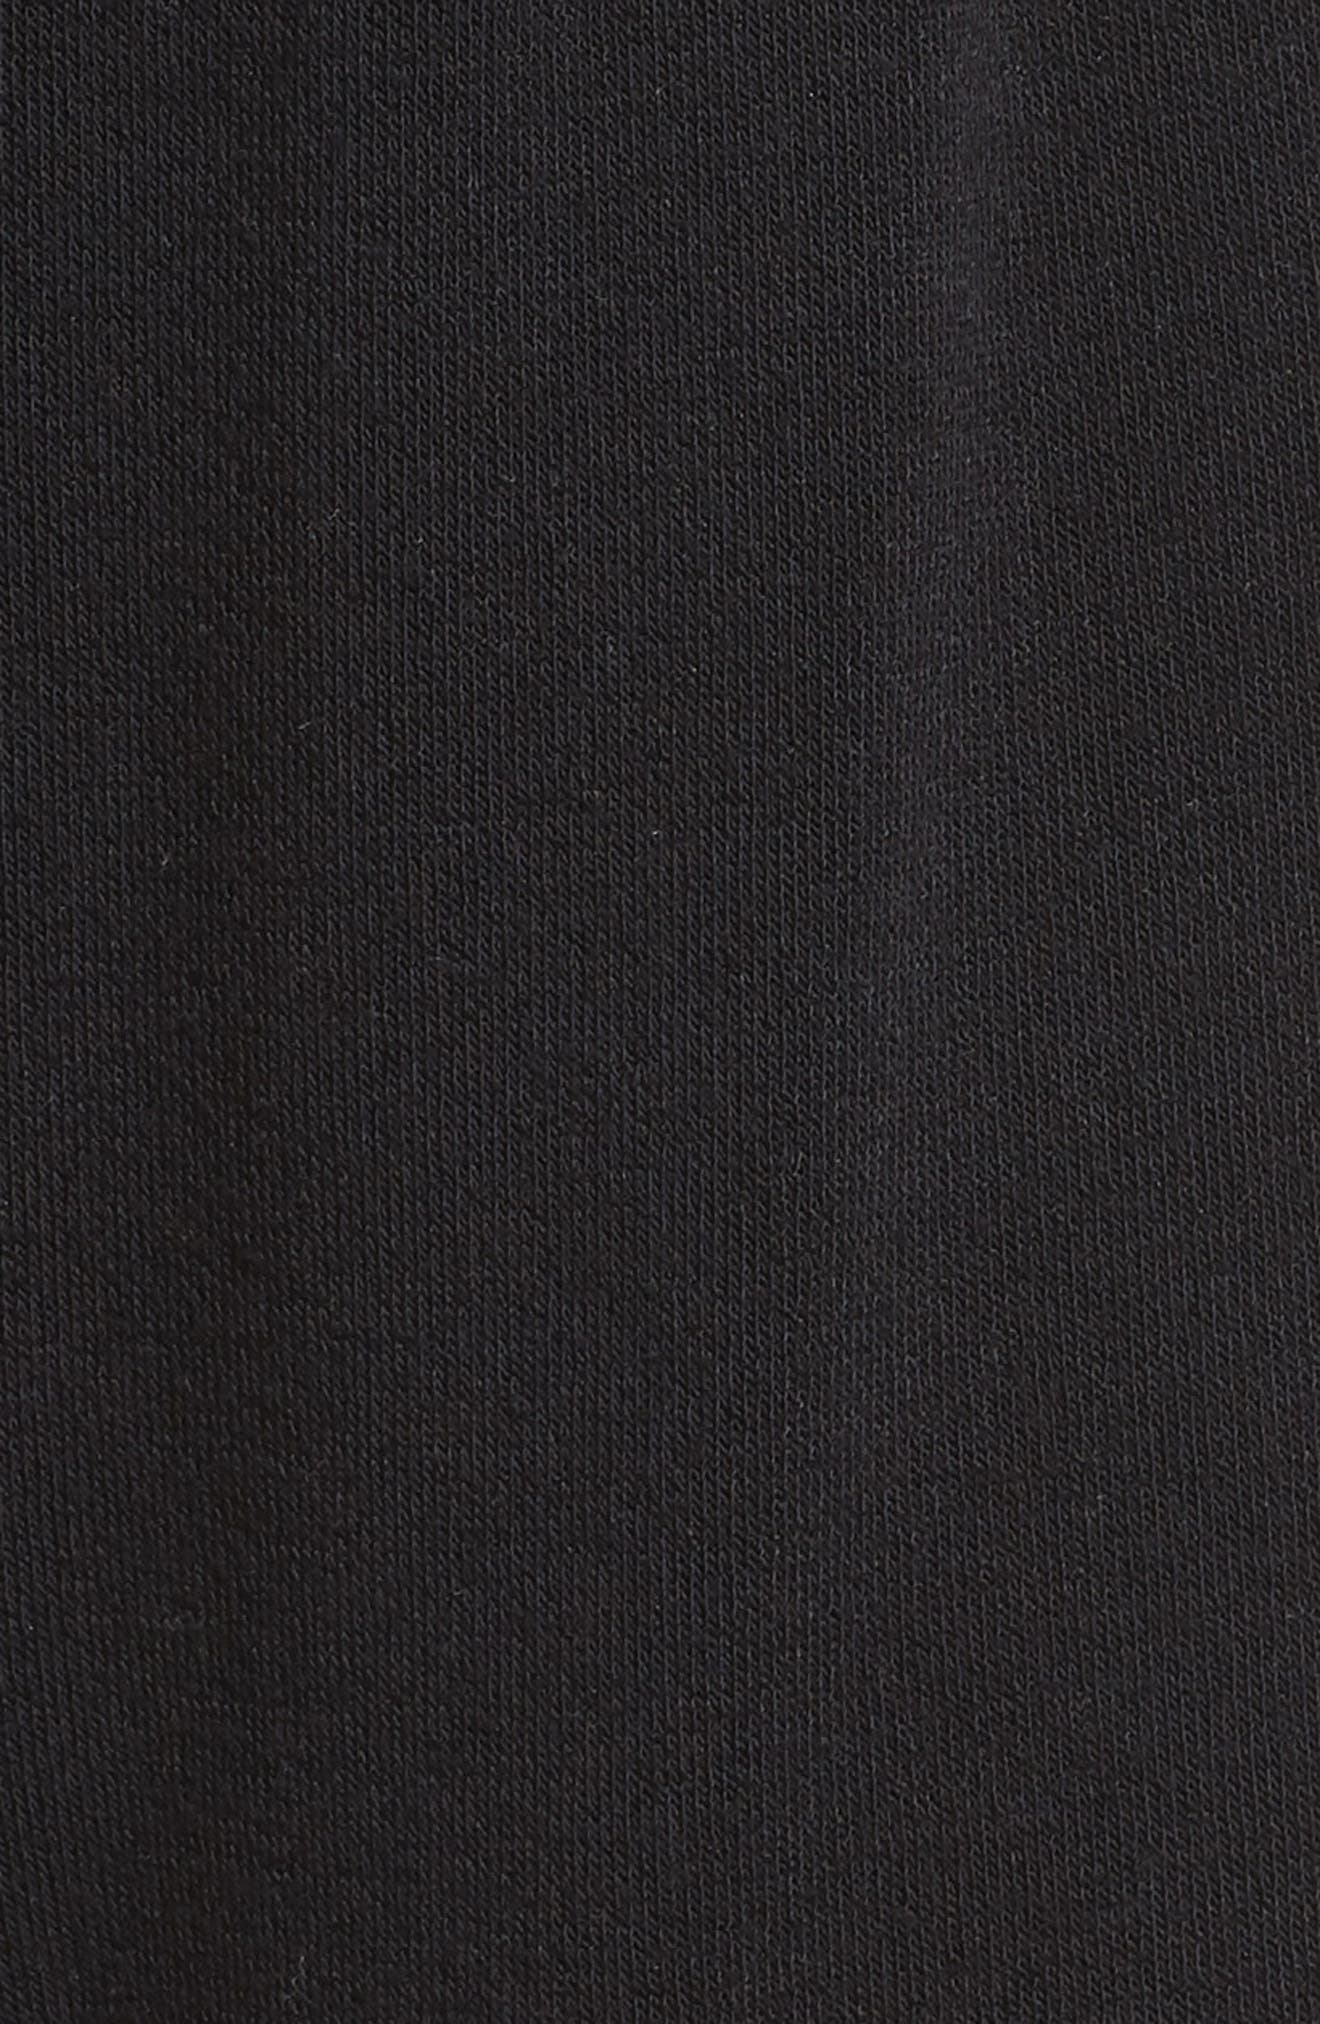 Dreamy High Rise Fleece Shorts,                             Alternate thumbnail 5, color,                             001